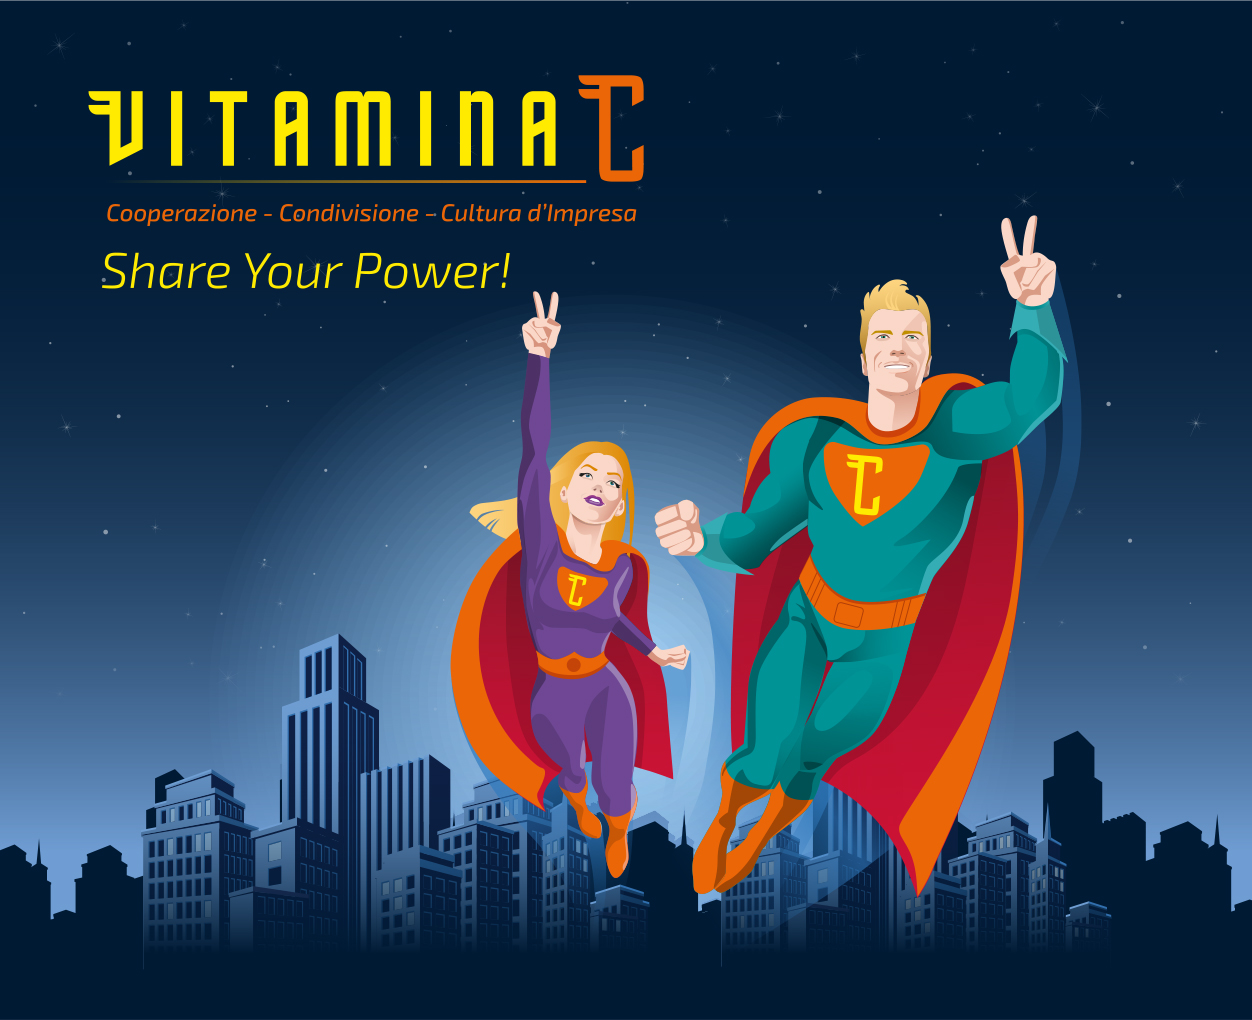 Vitamina C - Cooperazione, condivisione e cultura d'impresa